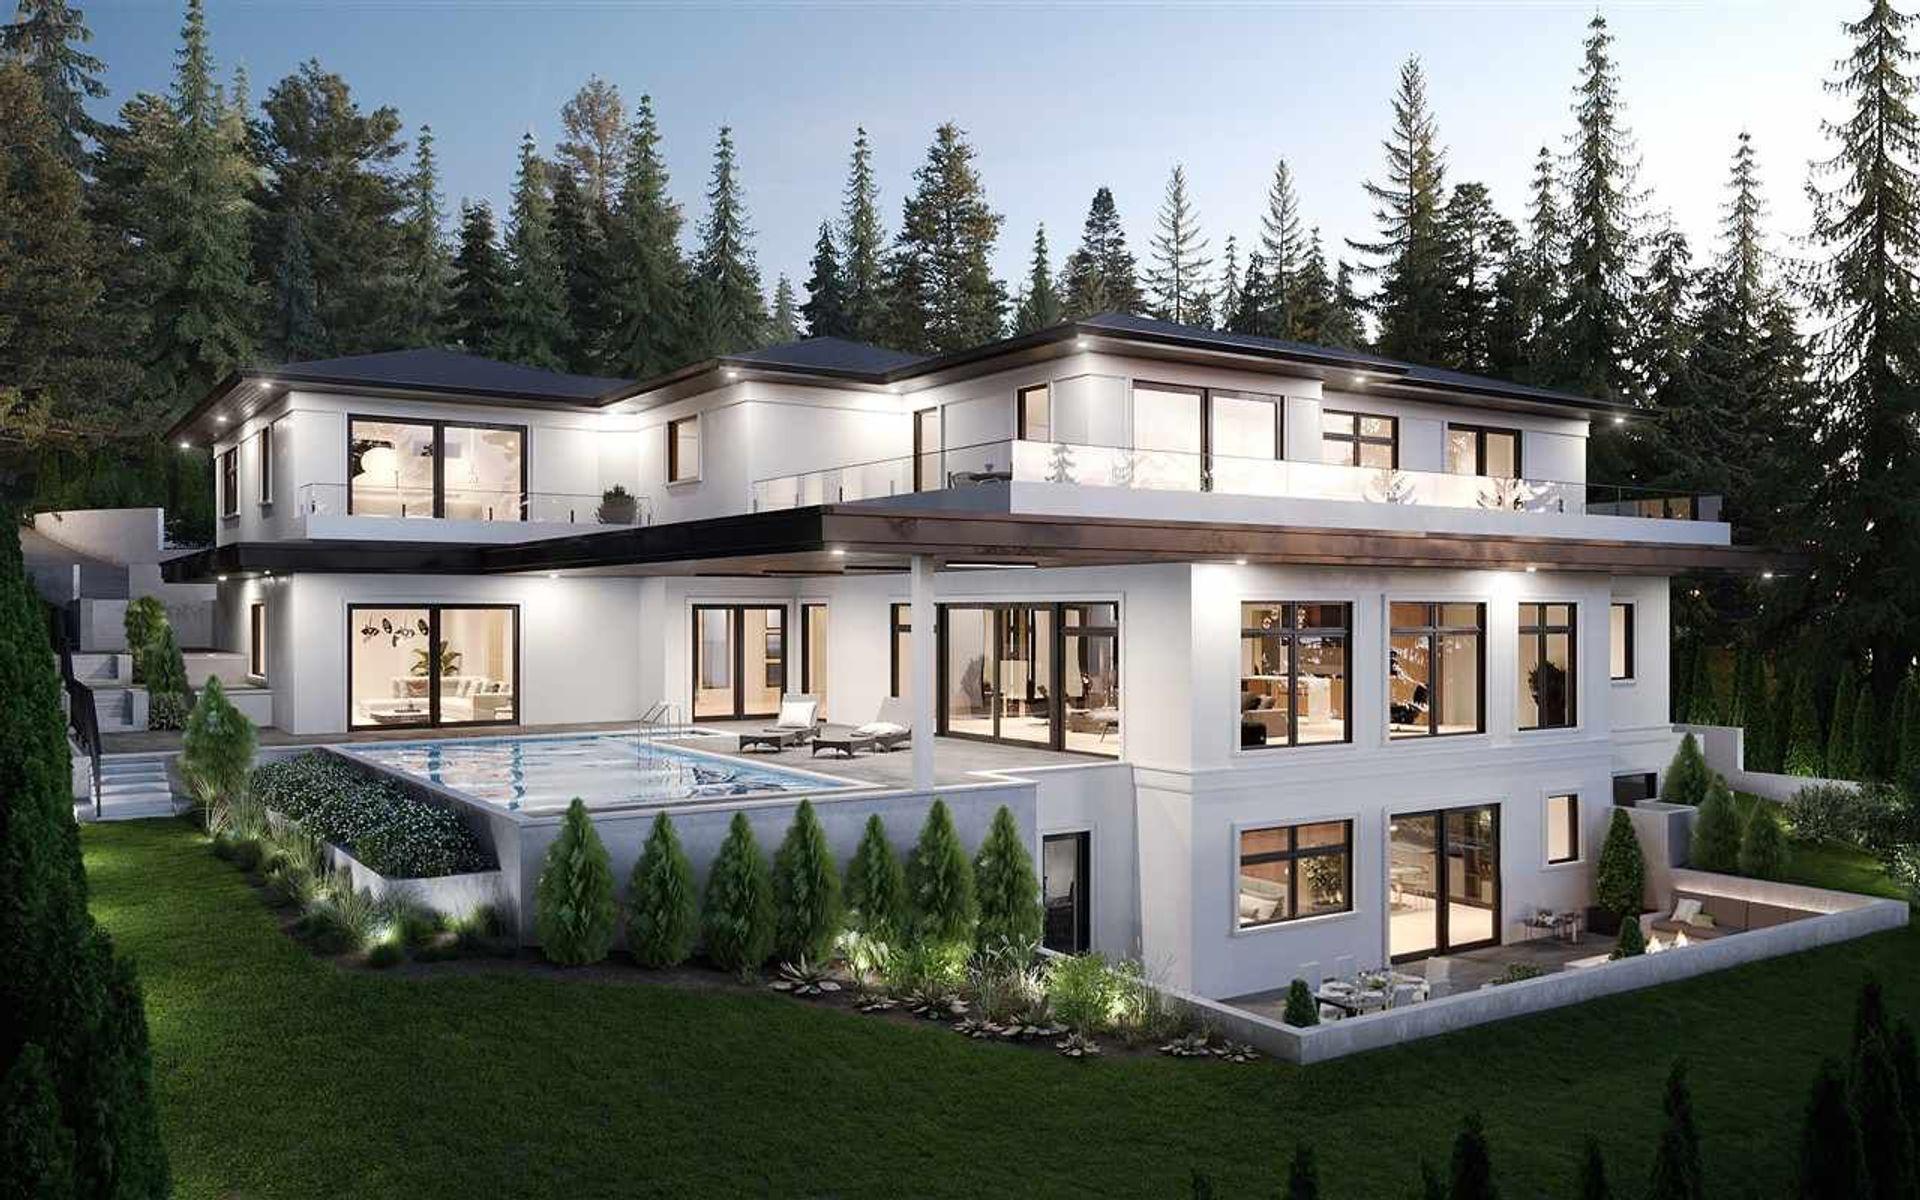 360-southborough-drive-british-properties-west-vancouver-01 at 360 Southborough Drive, British Properties, West Vancouver